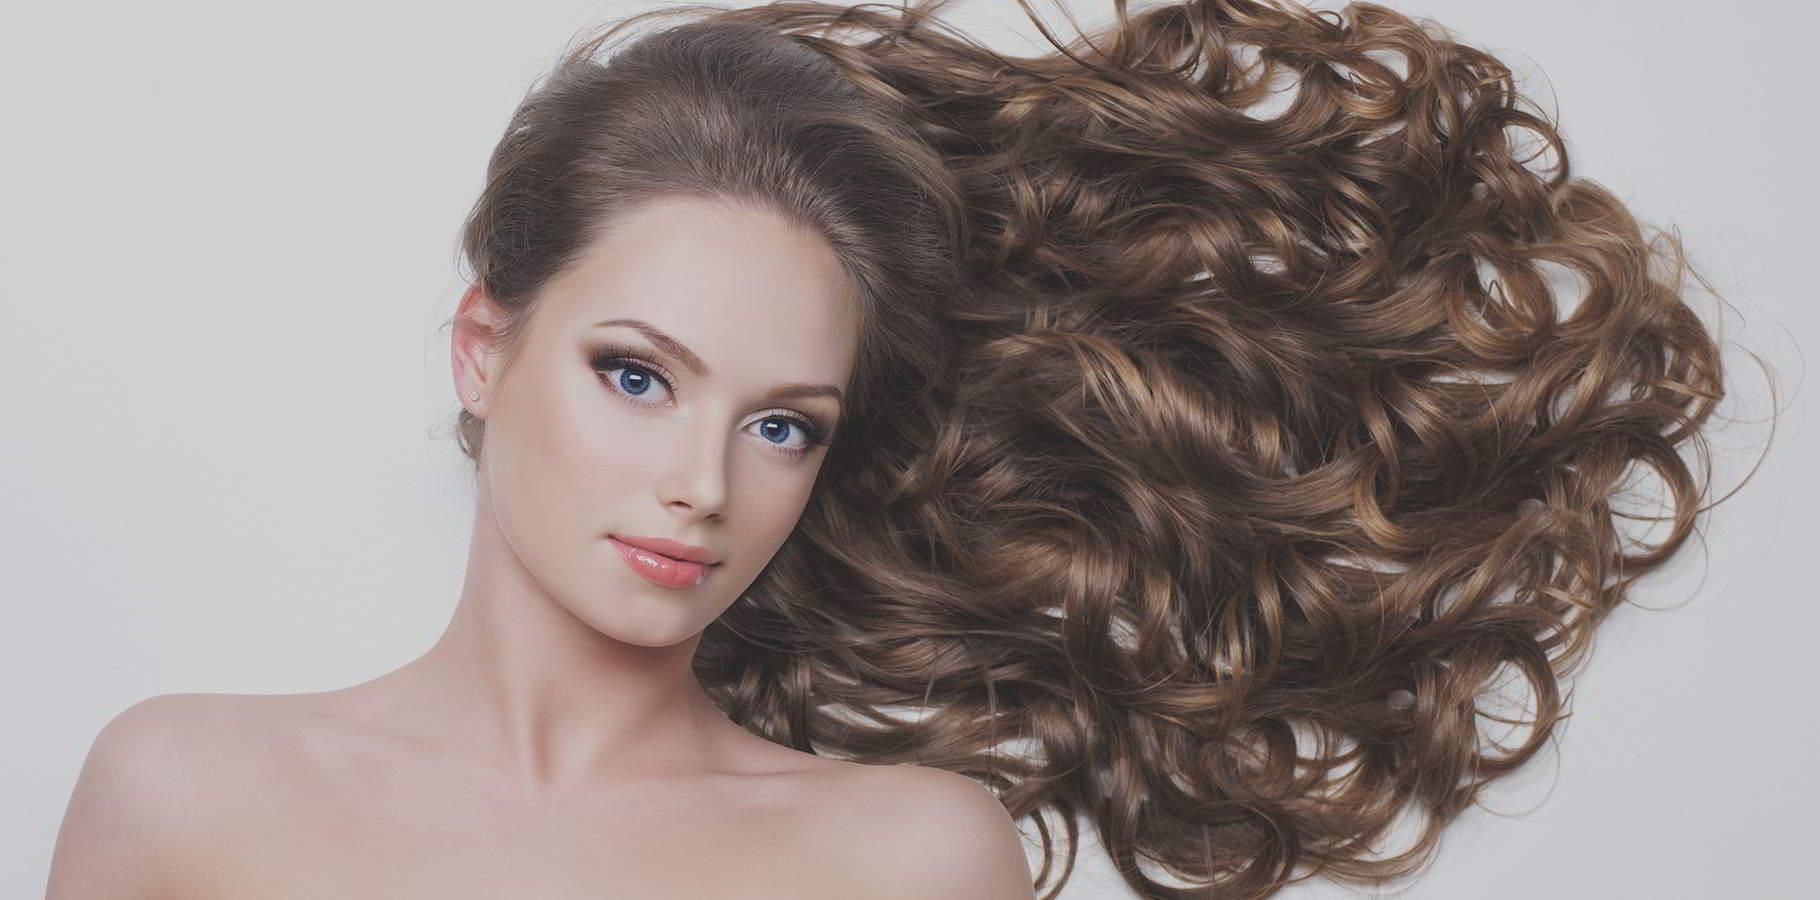 Tratamiento para pelo graso